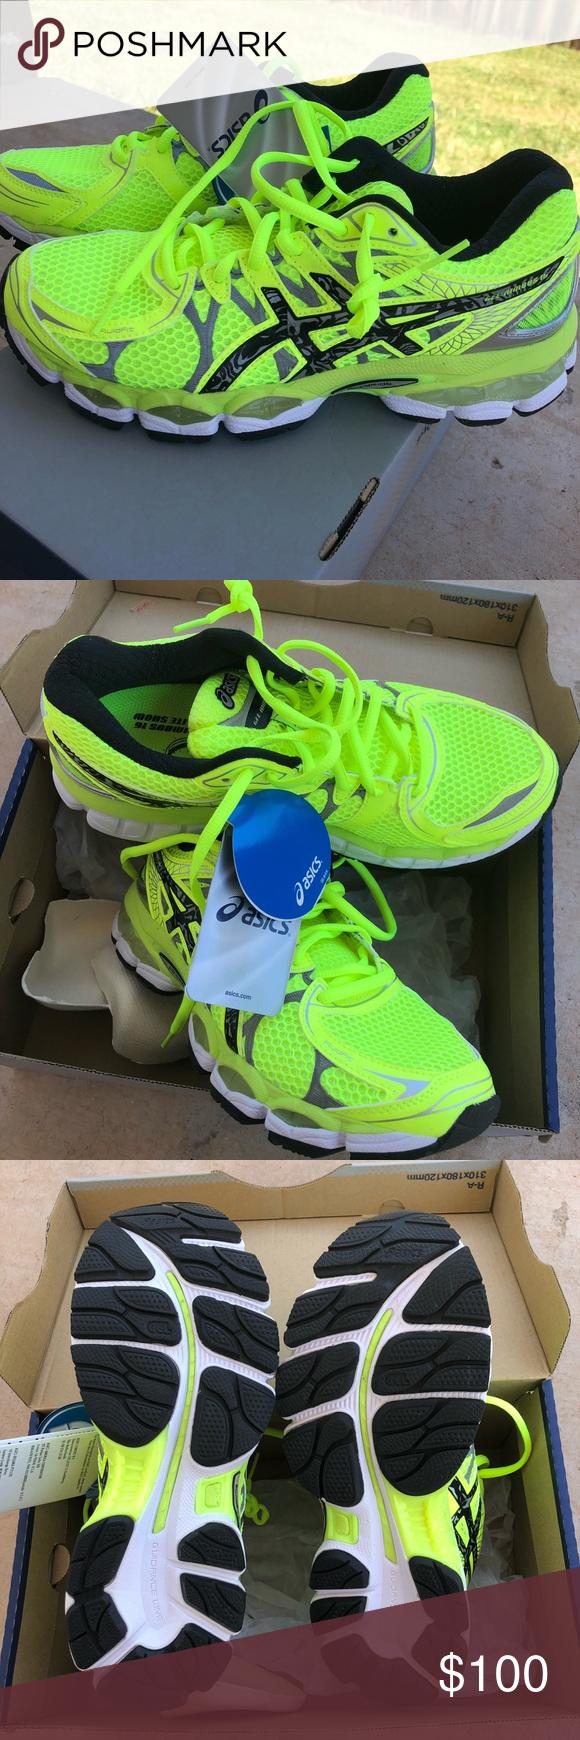 bbb9de411db0 NWT ASICS Gel-Nimbus 16 Lite Show Running Shoes Brand new in box! Color